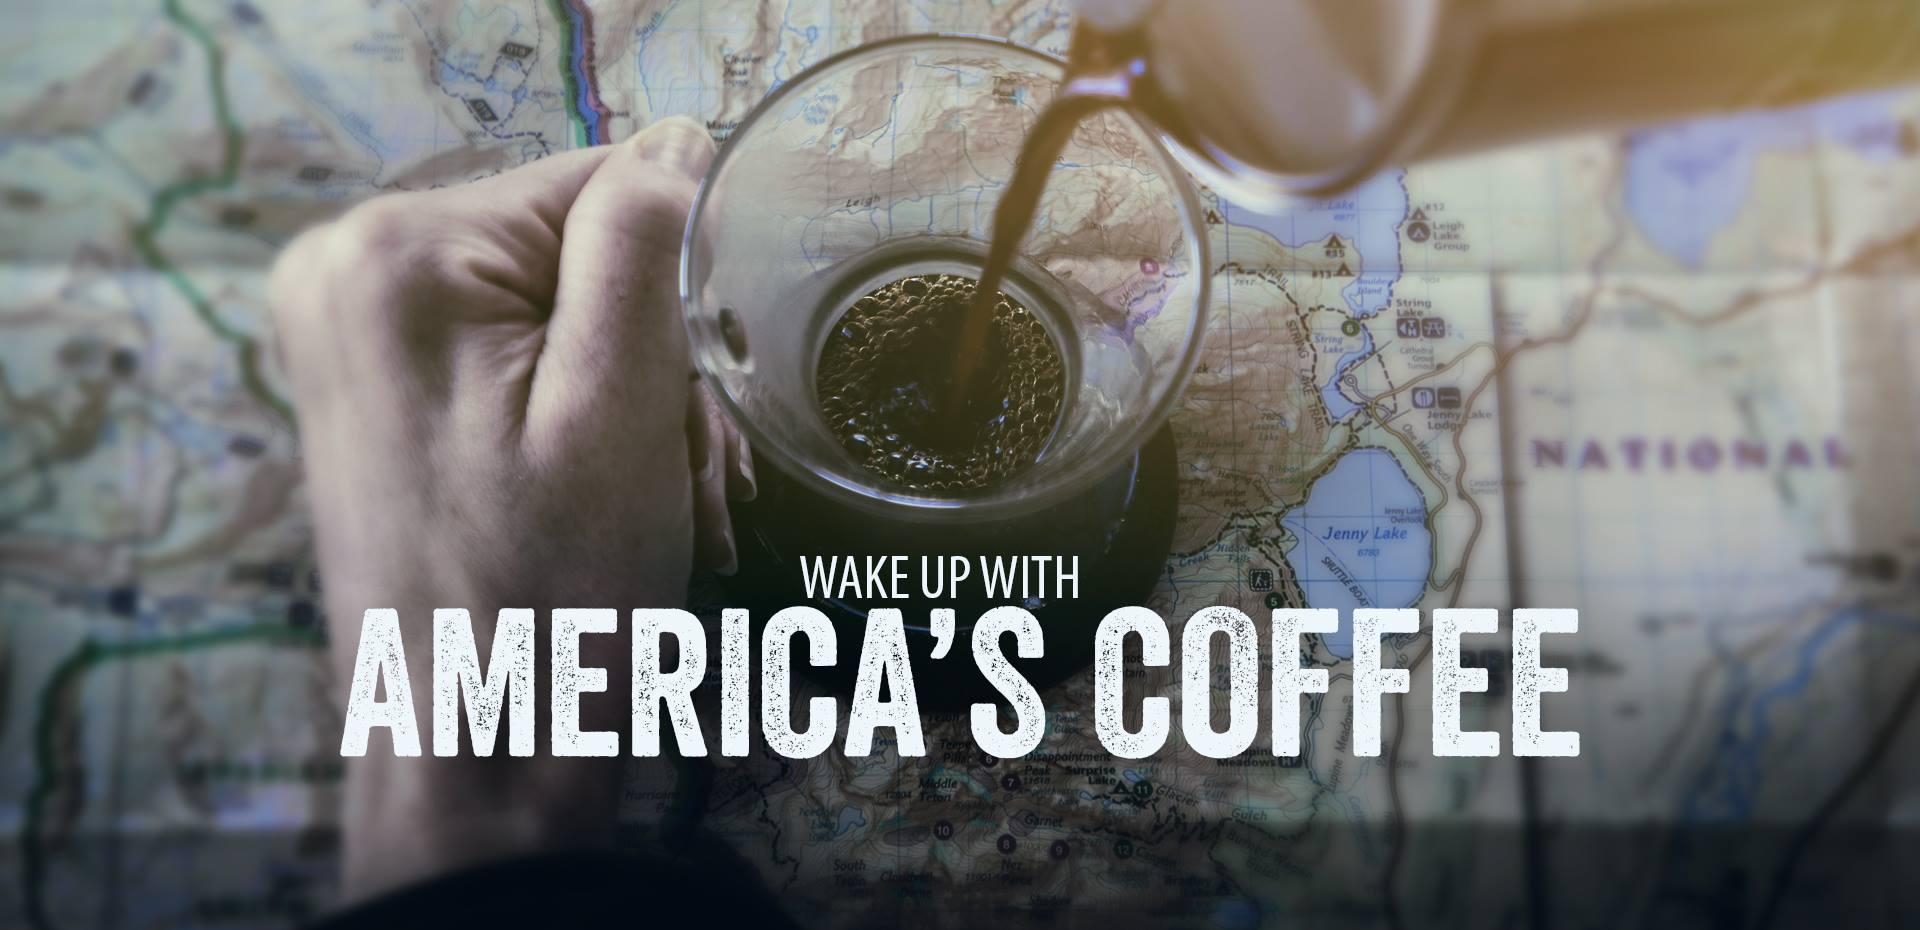 Black Rifle Coffee Company – Coffee shipped to you